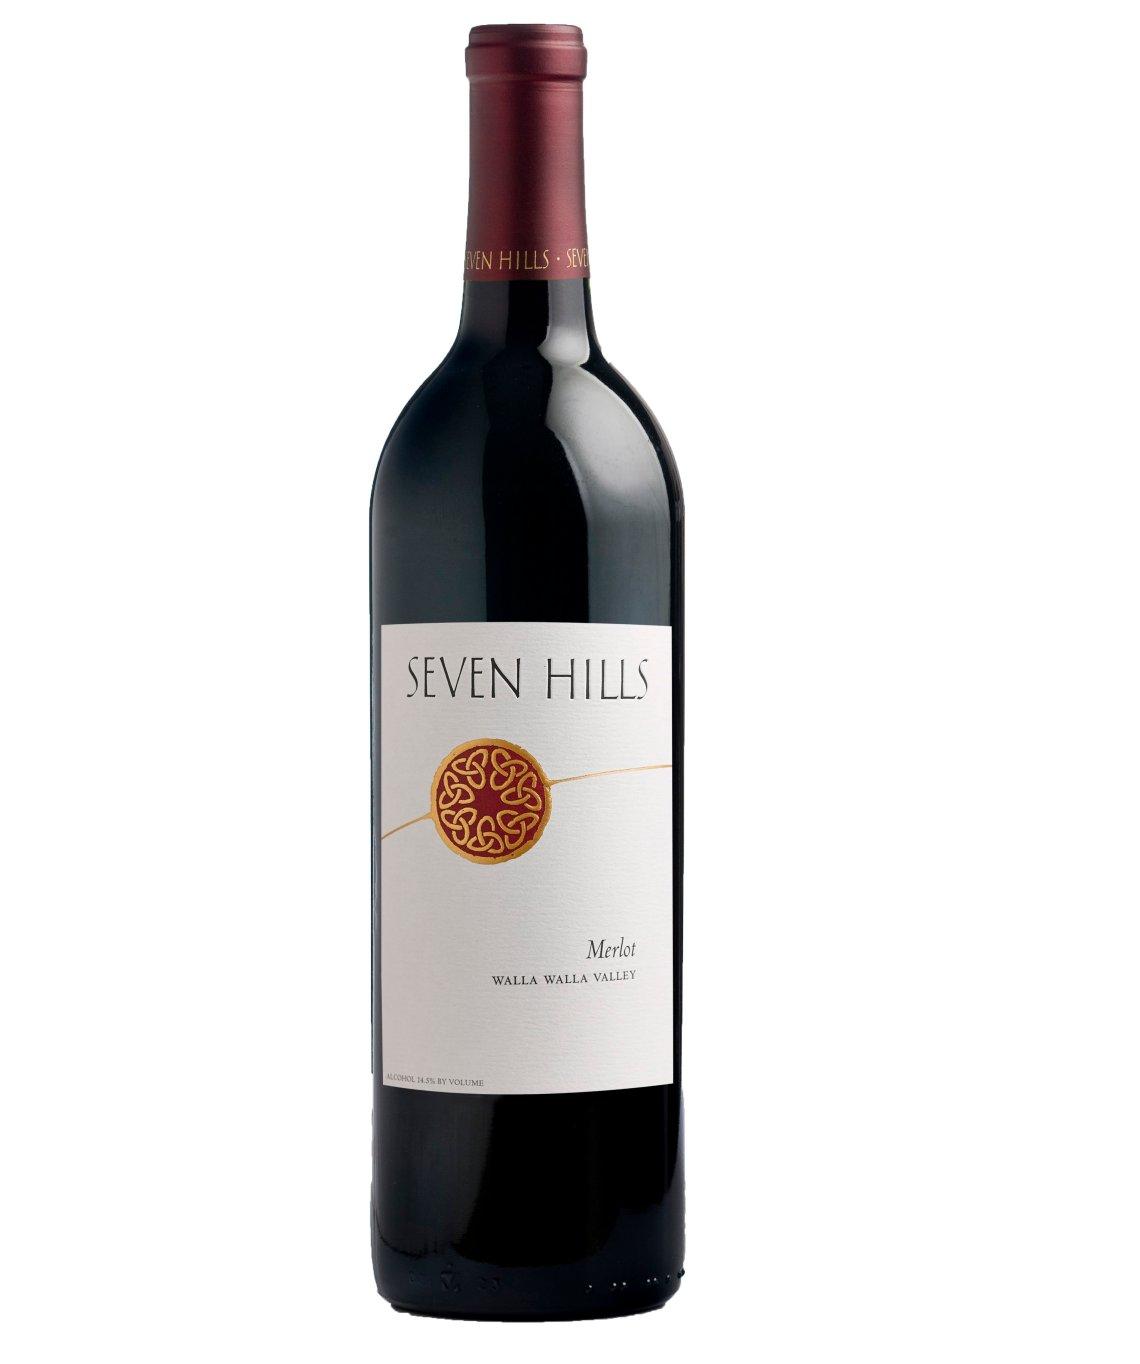 2016 Seven Hills Merlot Walla Walla Valley